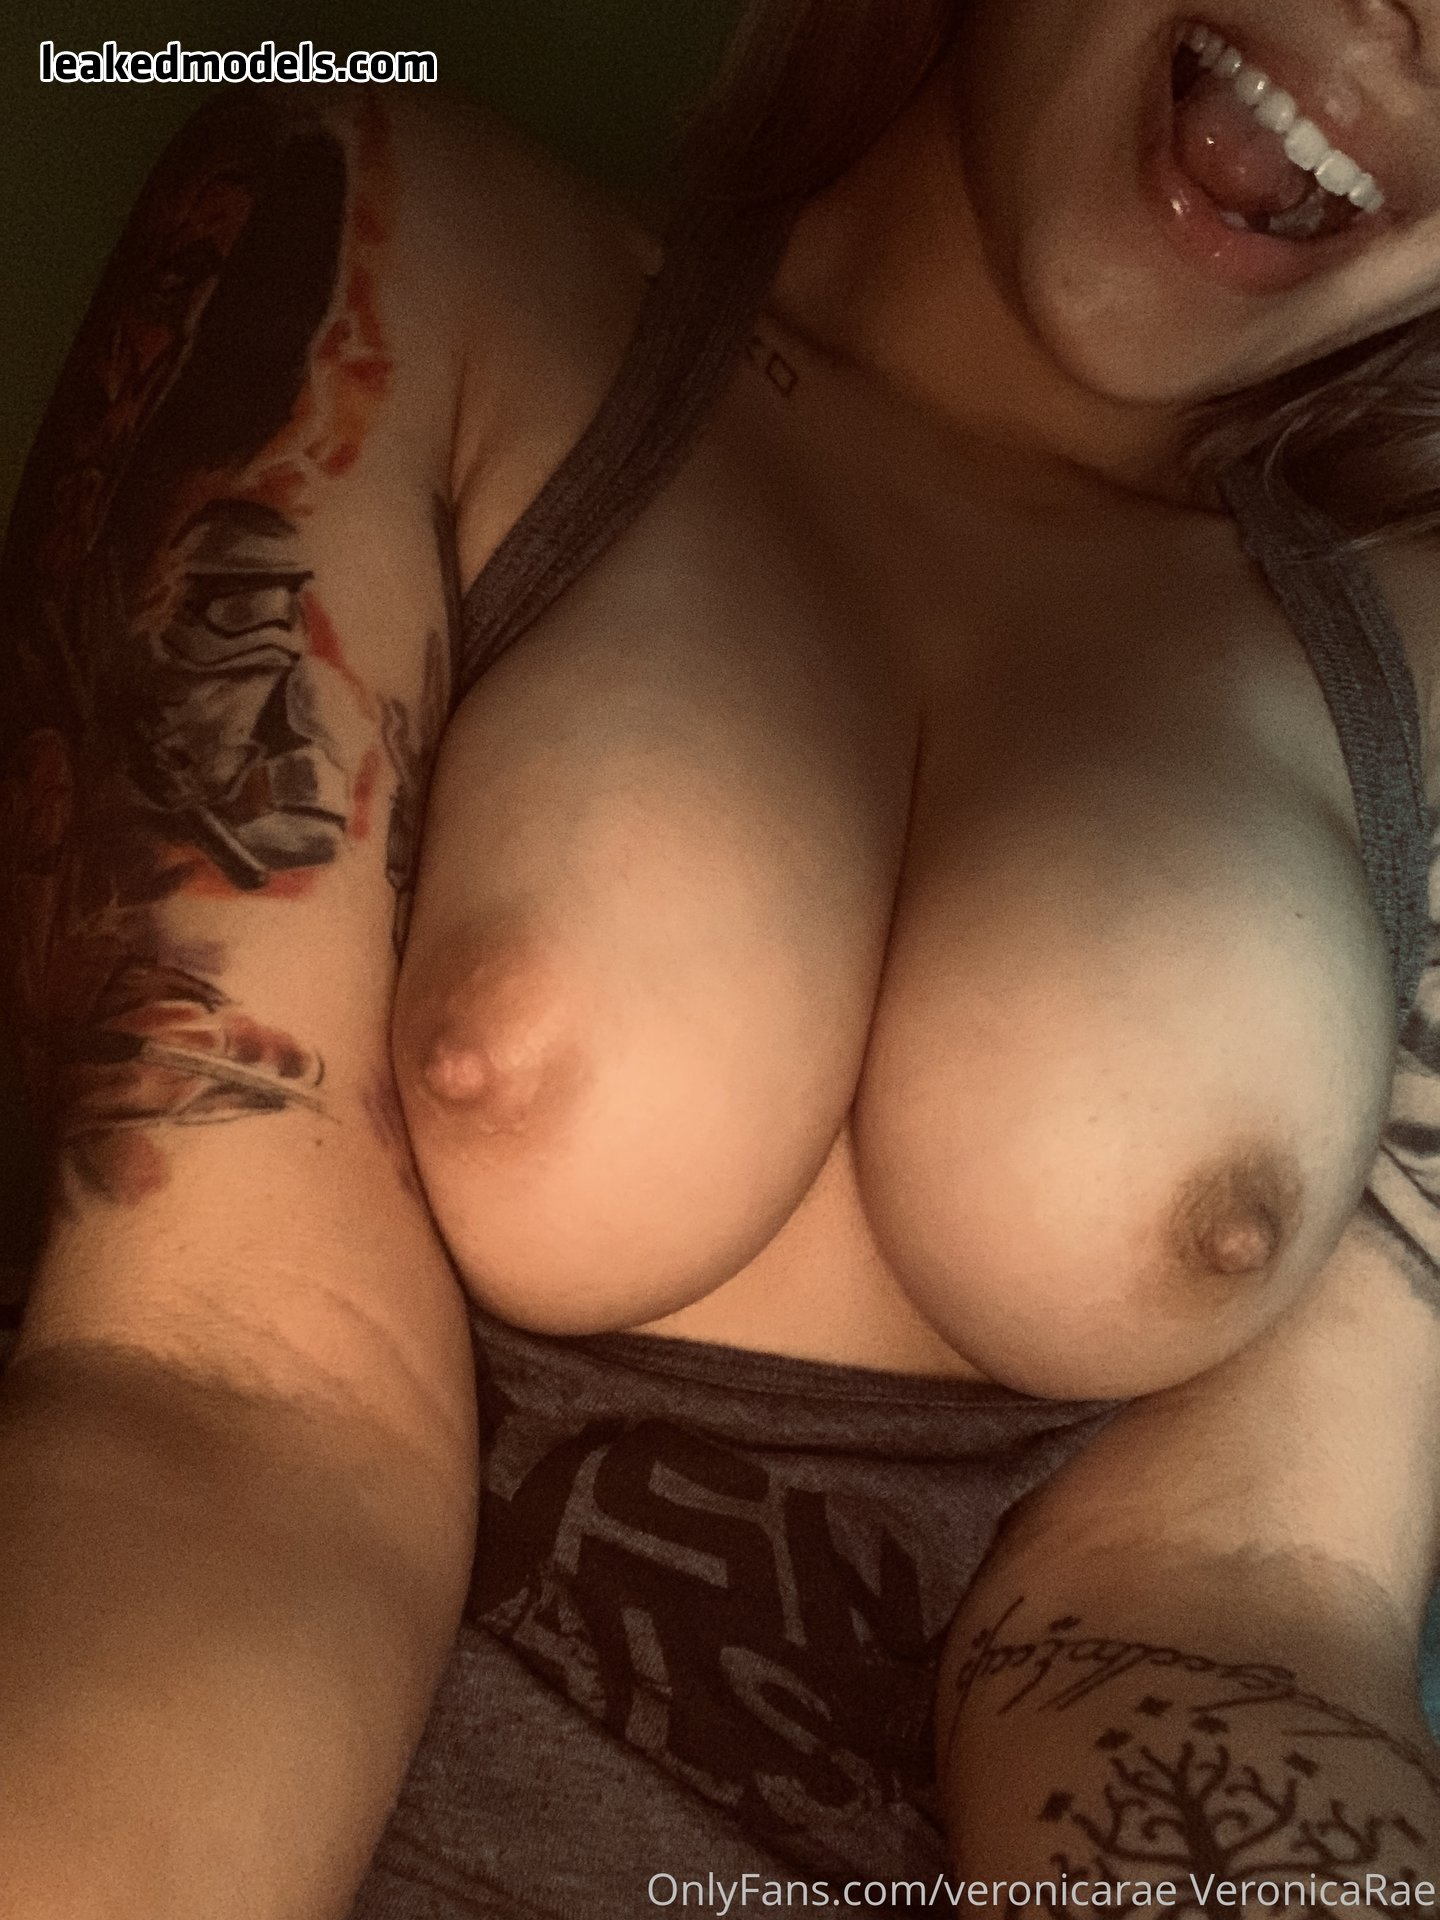 VeronicaRae OnlyFans Nude Leaks (33 Photos)